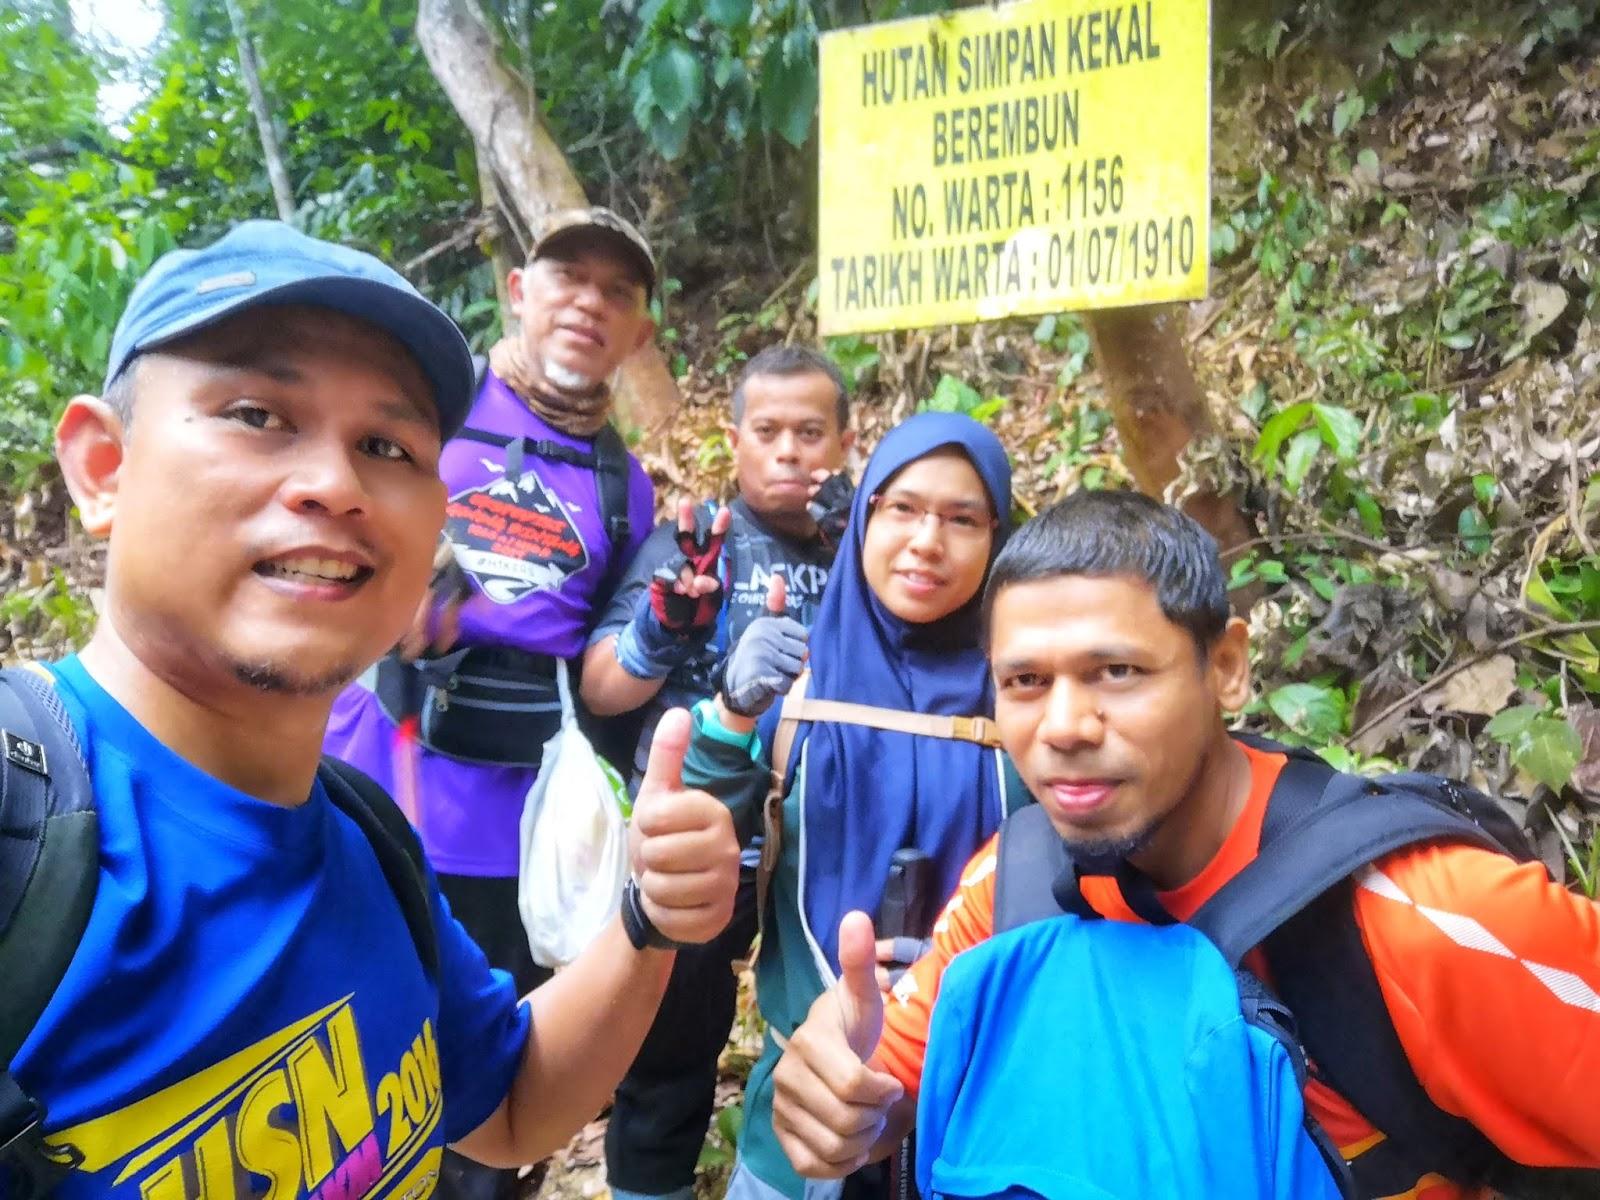 Mendaki Gunung Telapak Buruk & Gunung Berembun, Jelebu 2